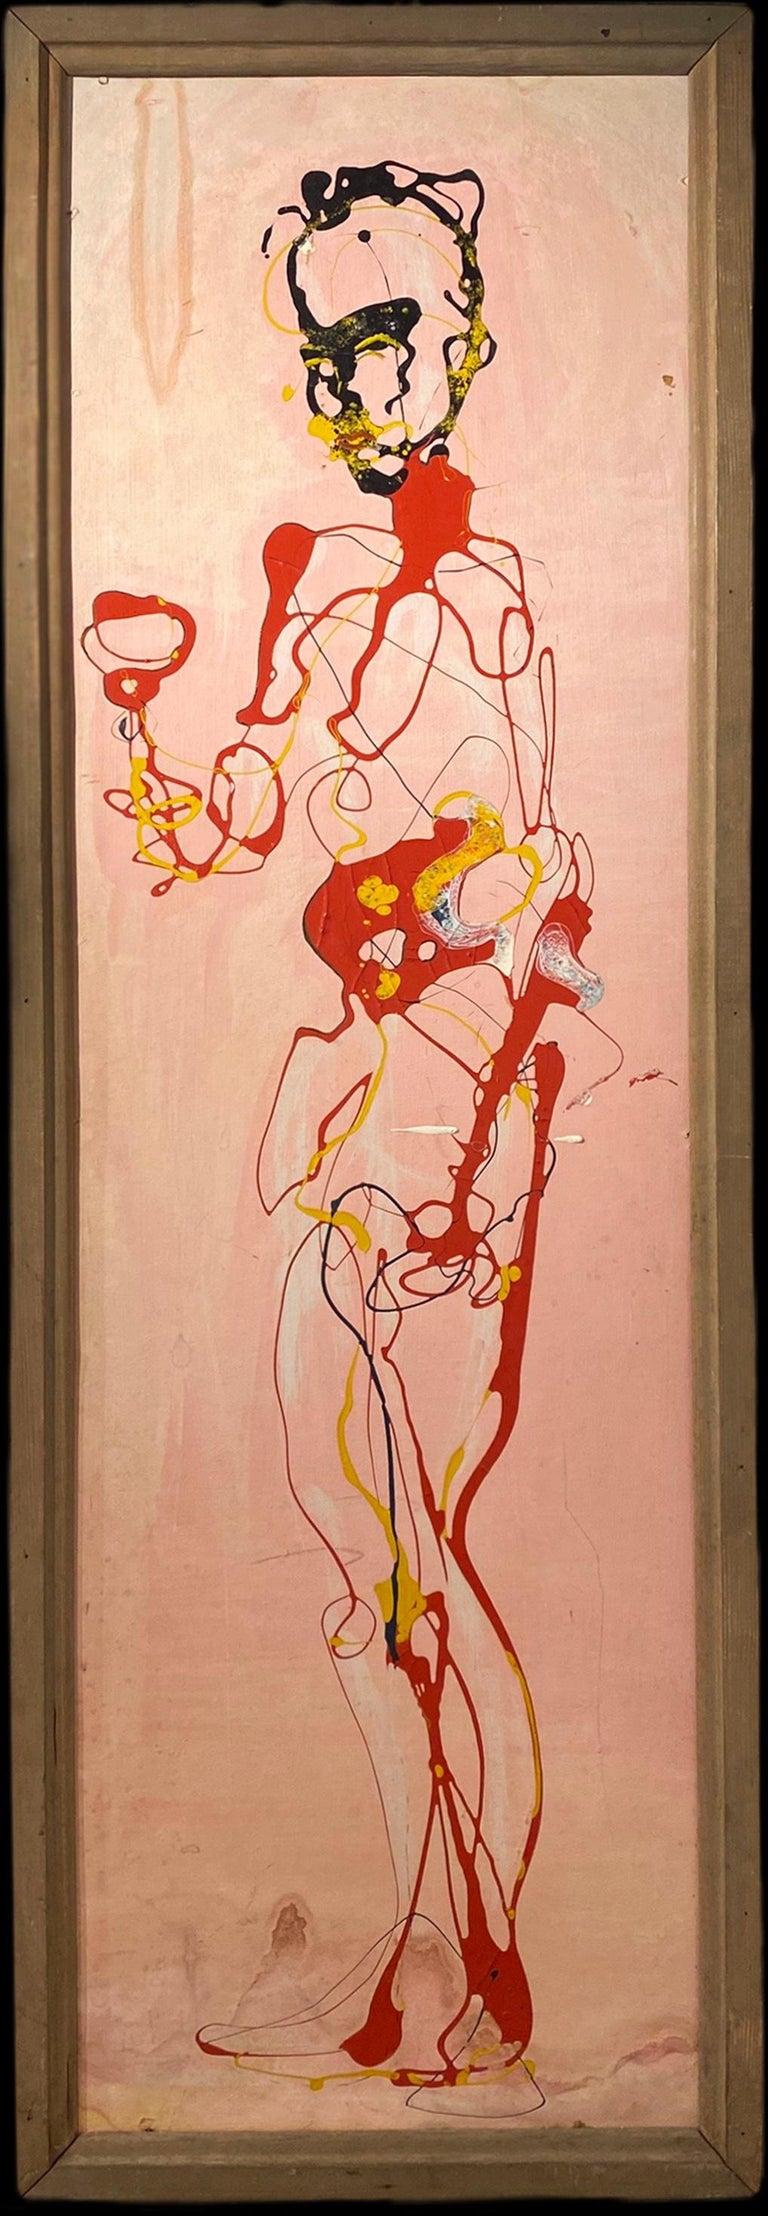 Ernest Trova Figurative Painting - The Last Roman (for the poet, Ezra Pound)